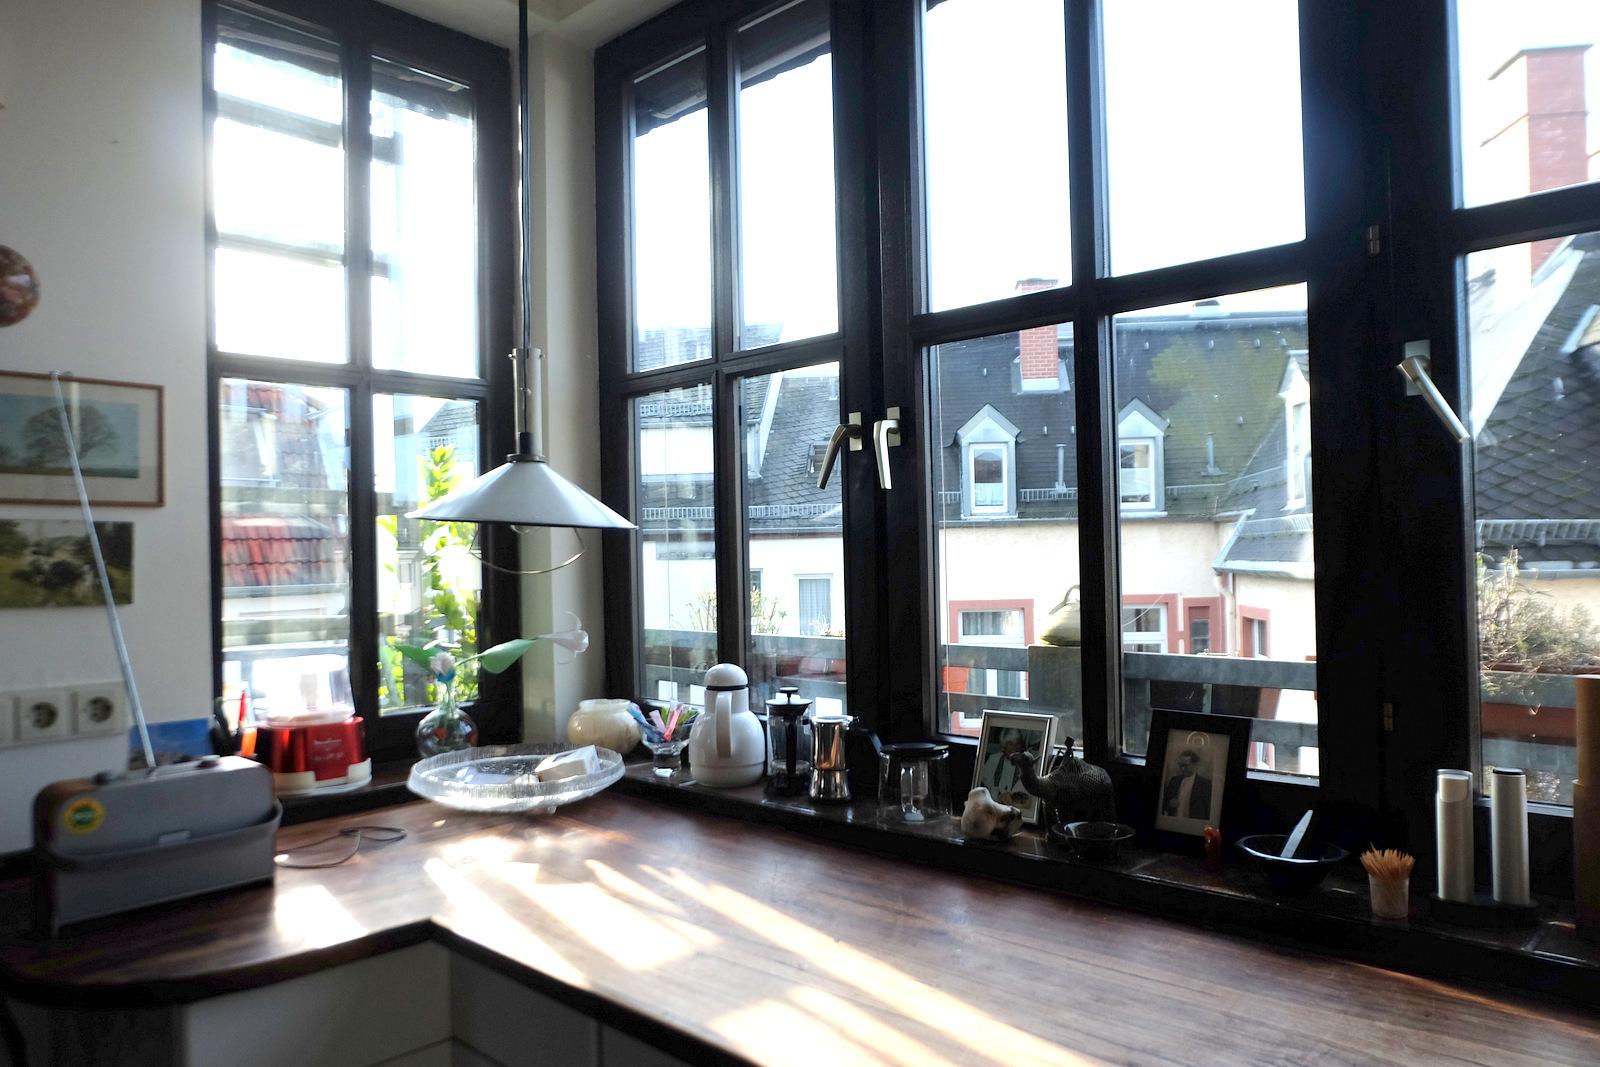 dscf1550 Roof apartment %Bockenheim